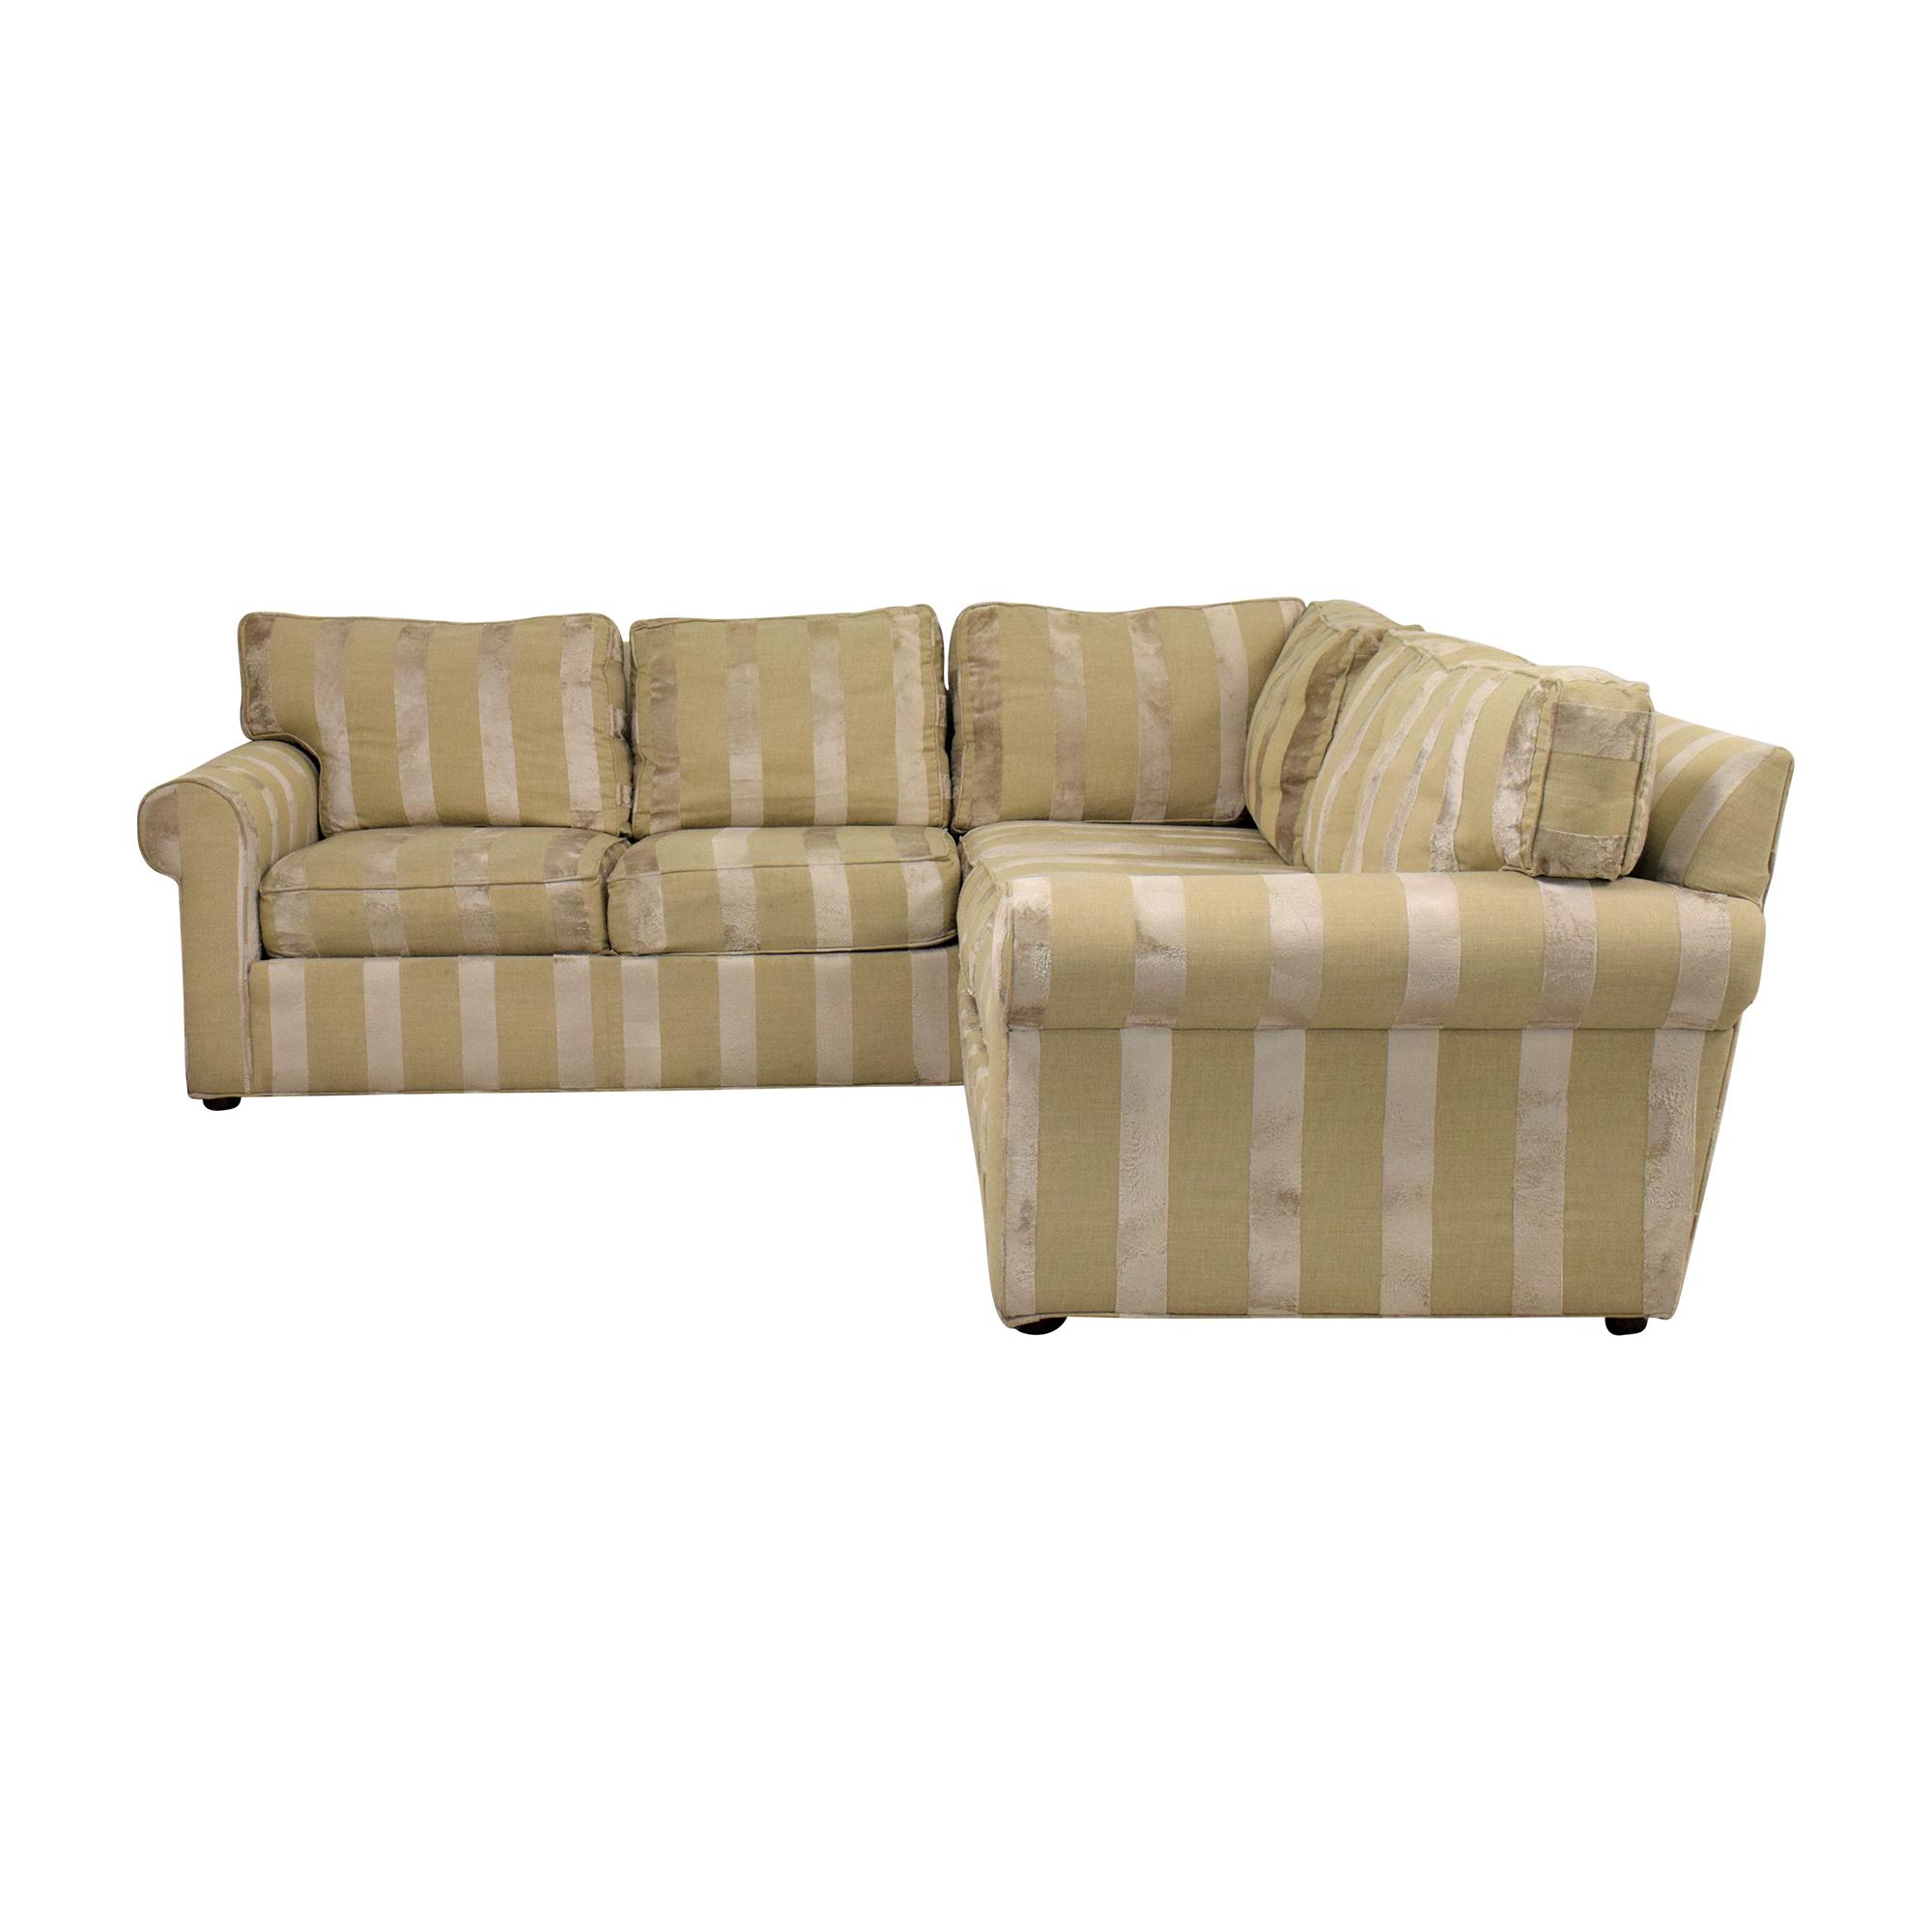 buy Ethan Allen Ethan Allen Bennet Sectional Sofa online